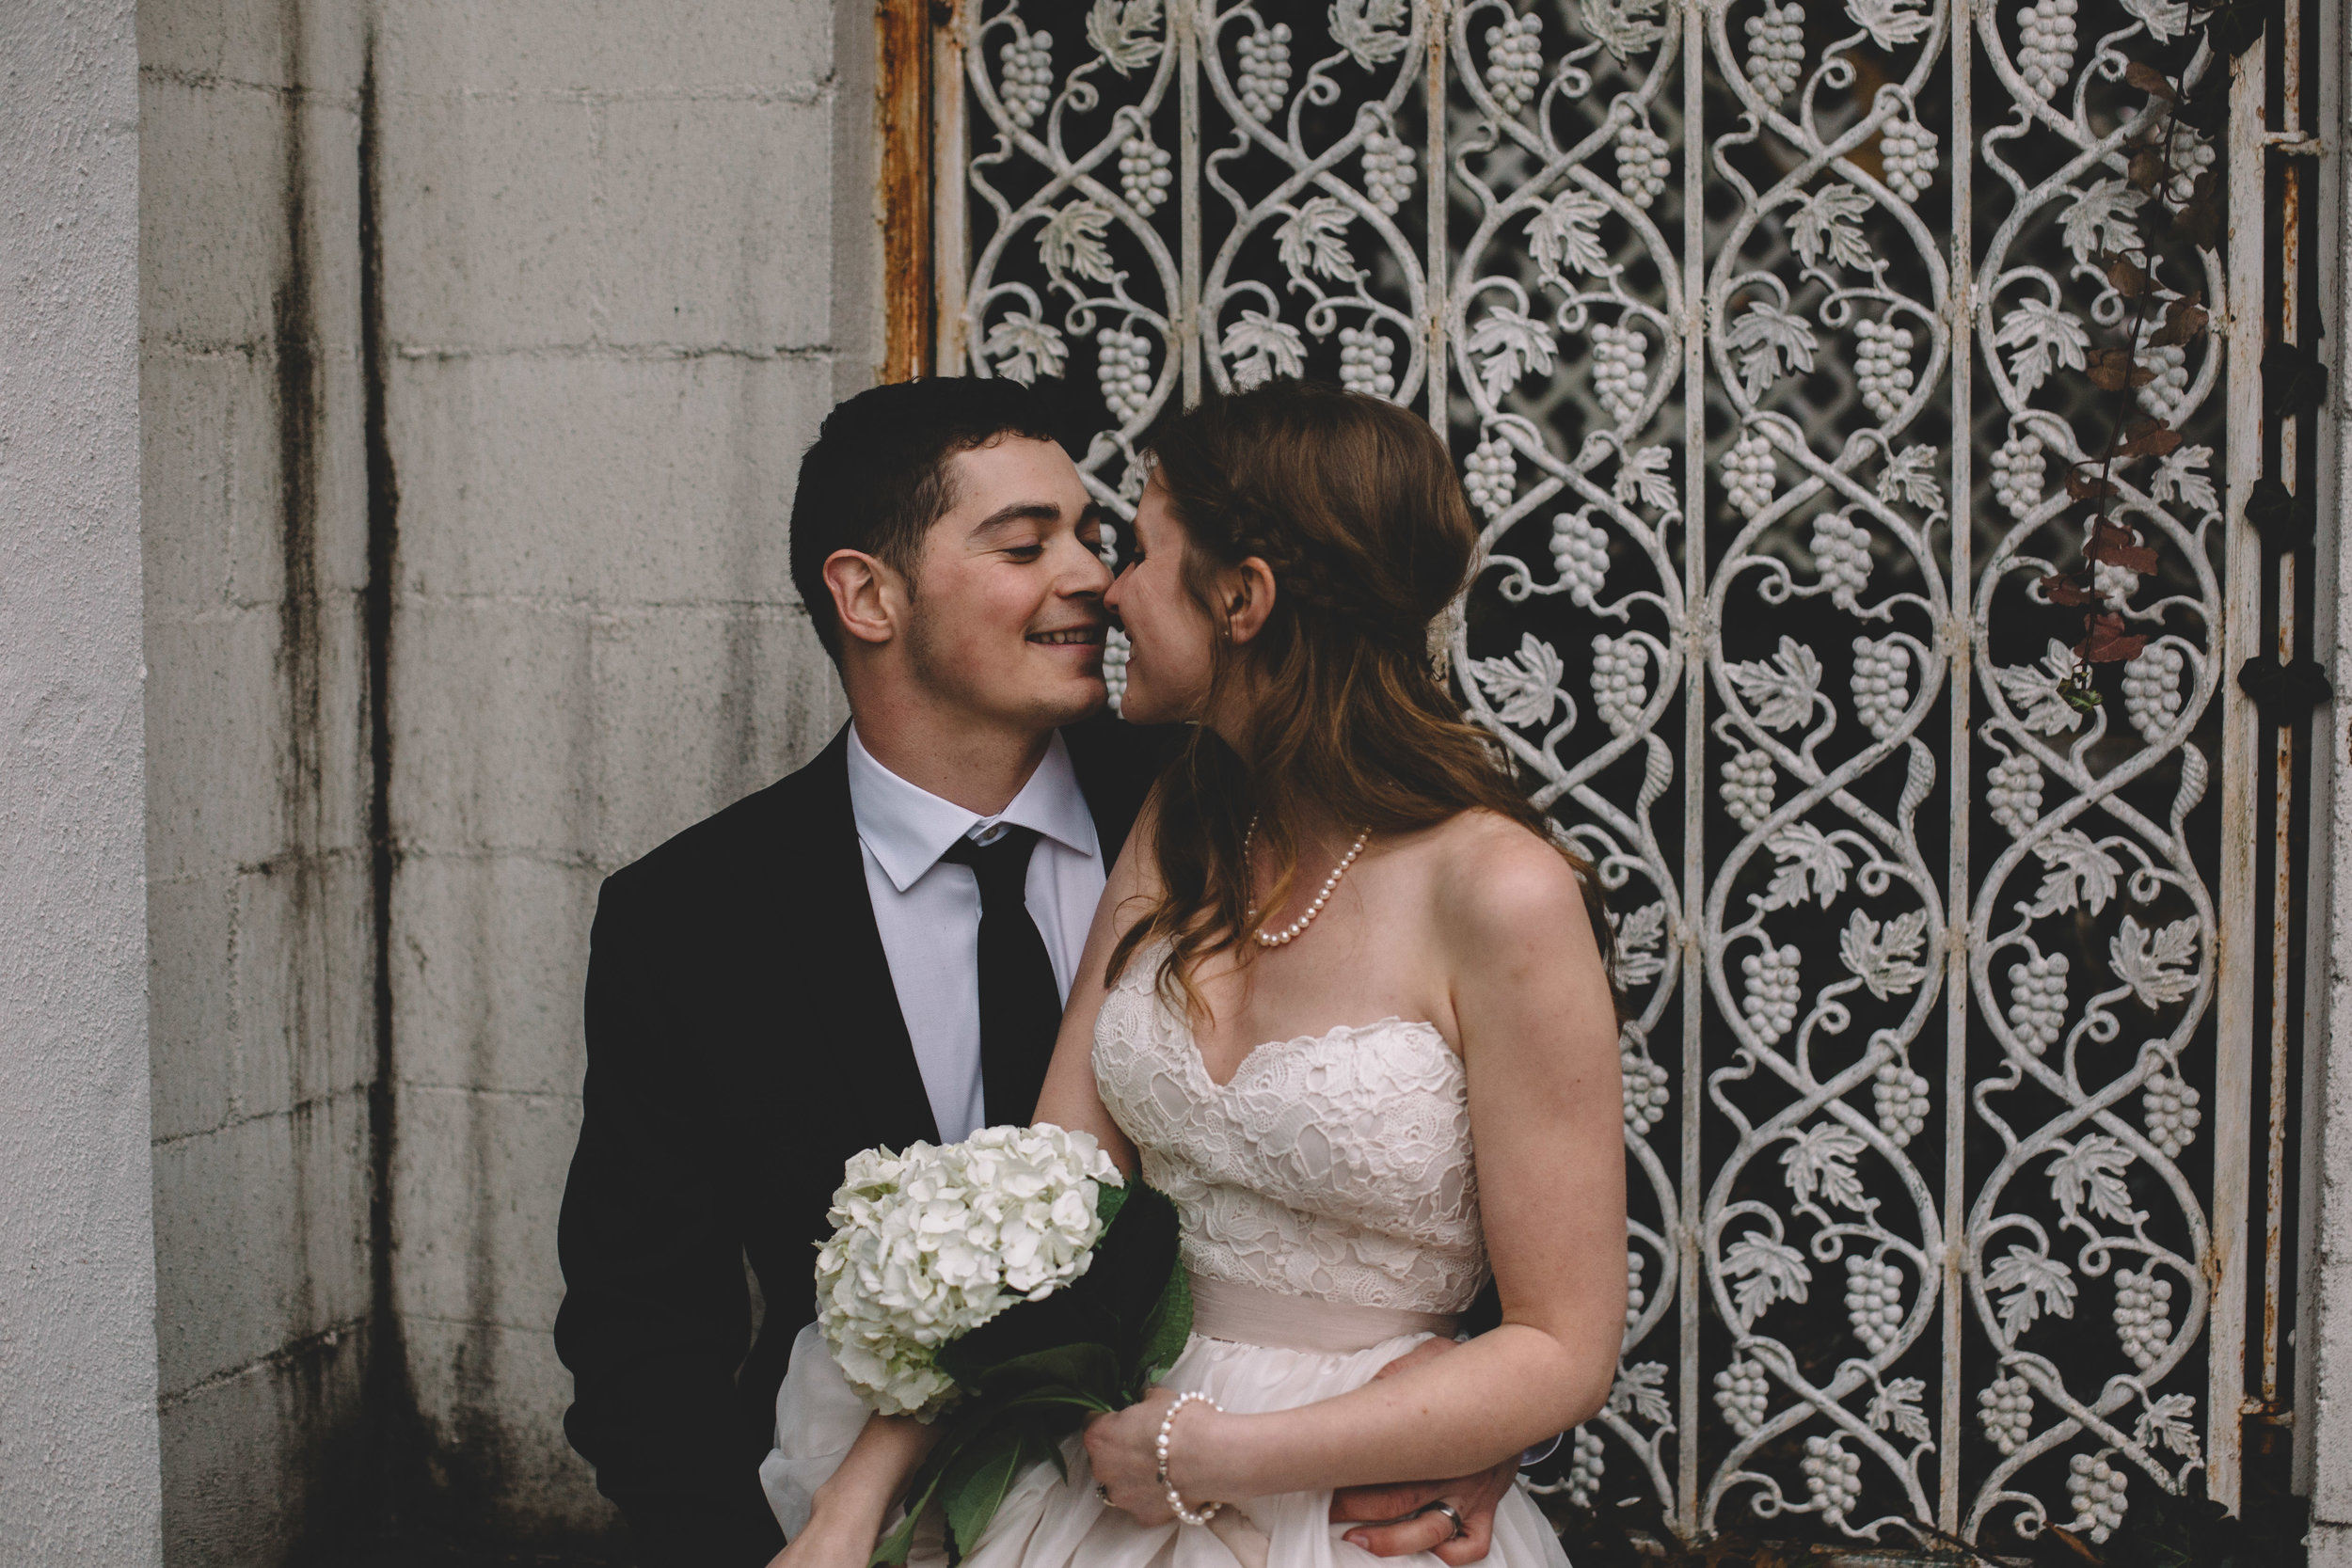 Jake + Brittney Balbas Airbnb Carriage House Wedding Evansville IN (345 of 426).jpg